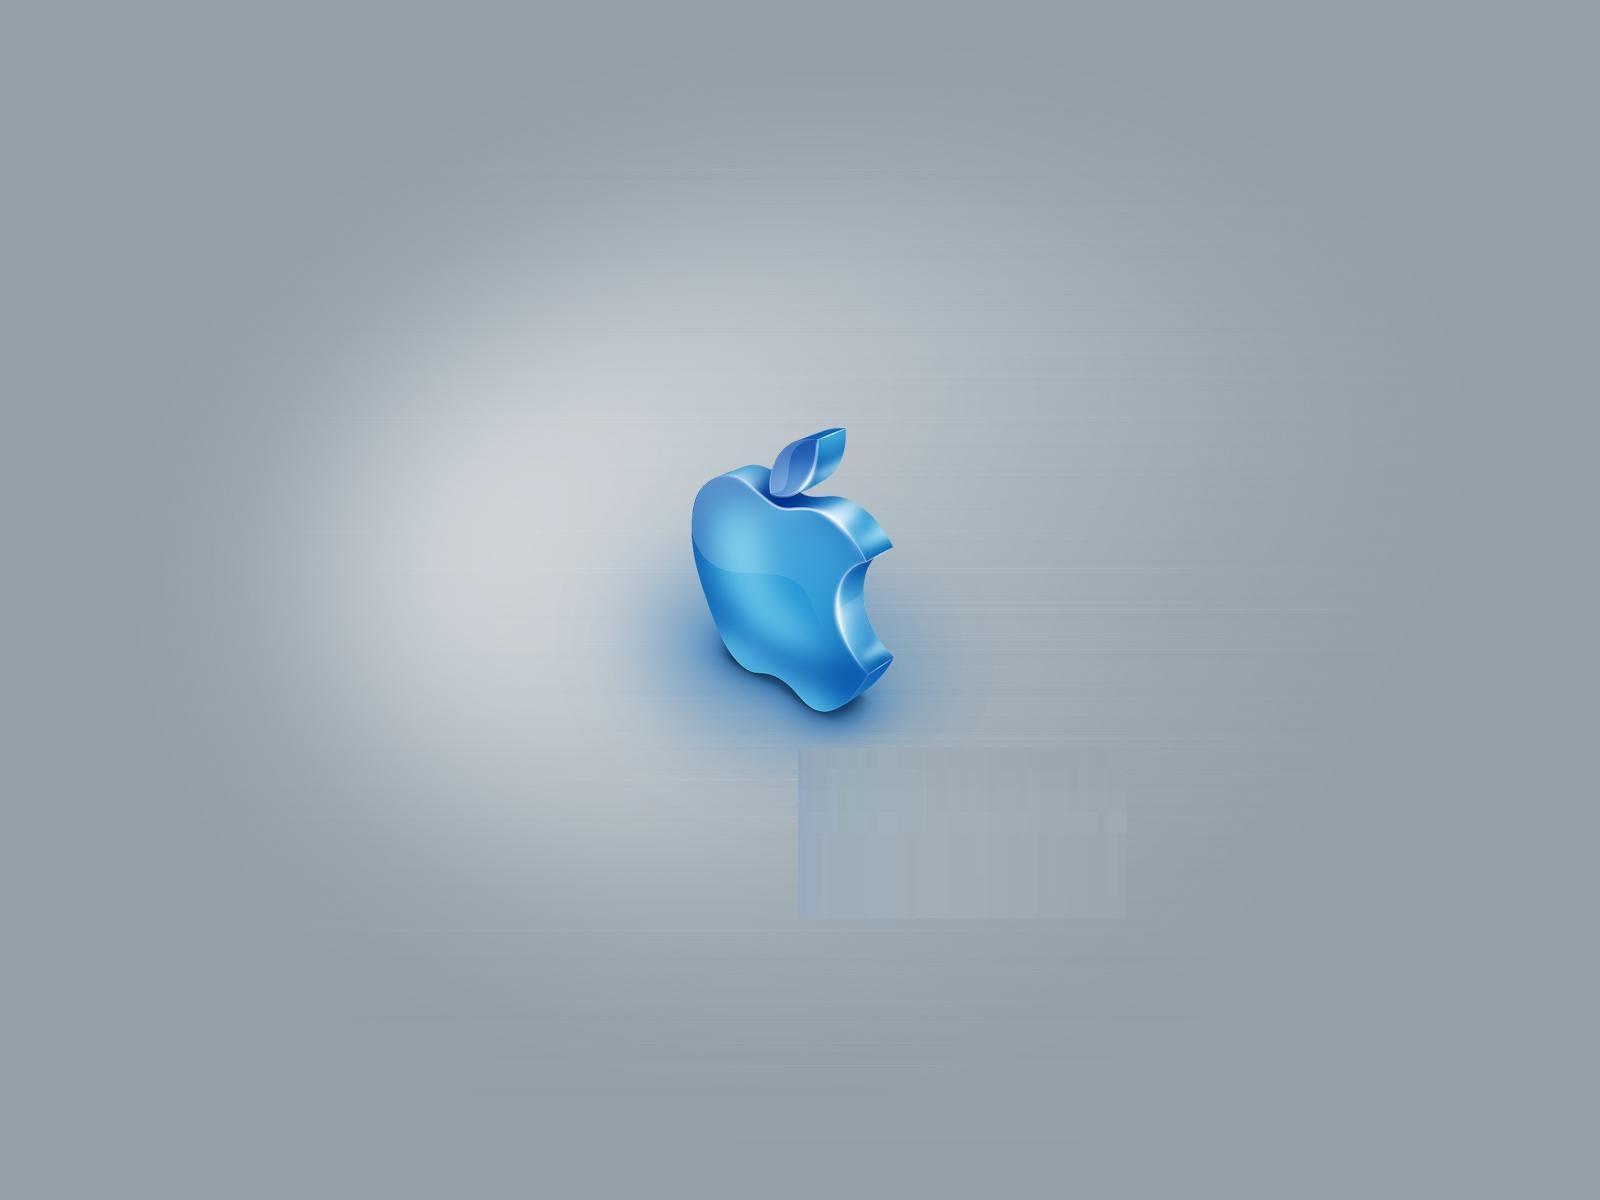 apple desktop background apple desktop backgrounds Desktop 1600x1200